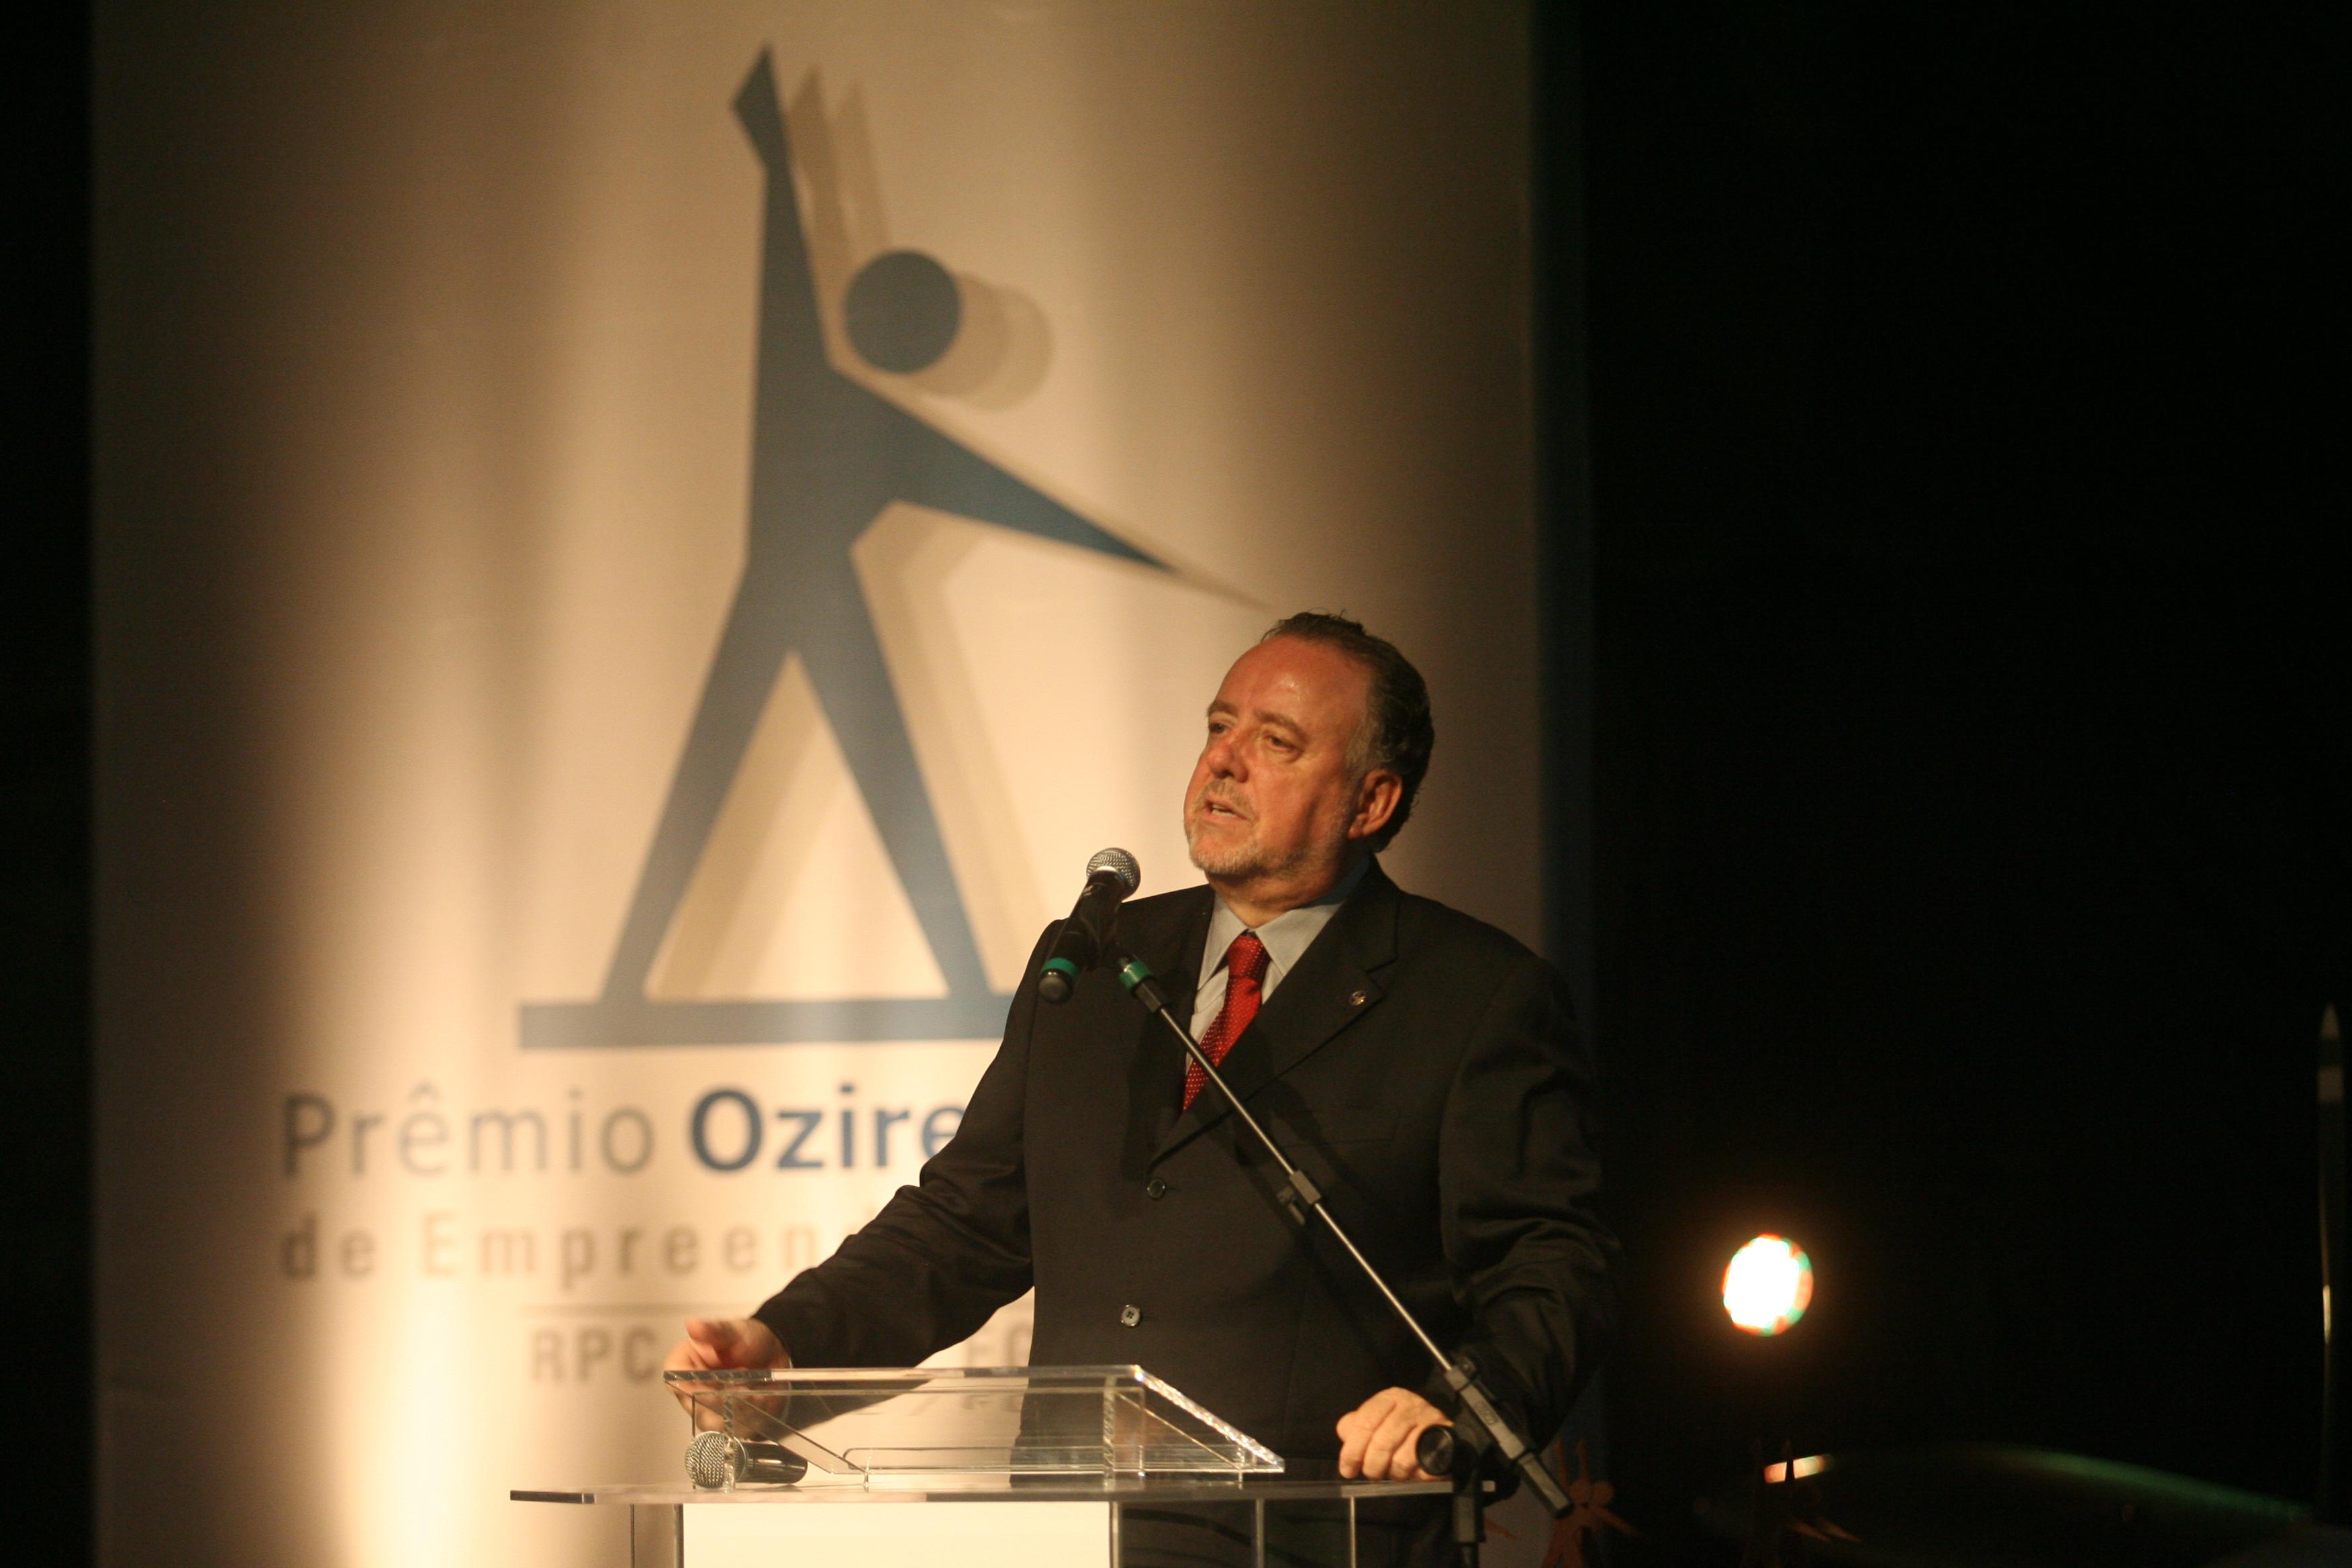 IX Prêmio Ozires Silva